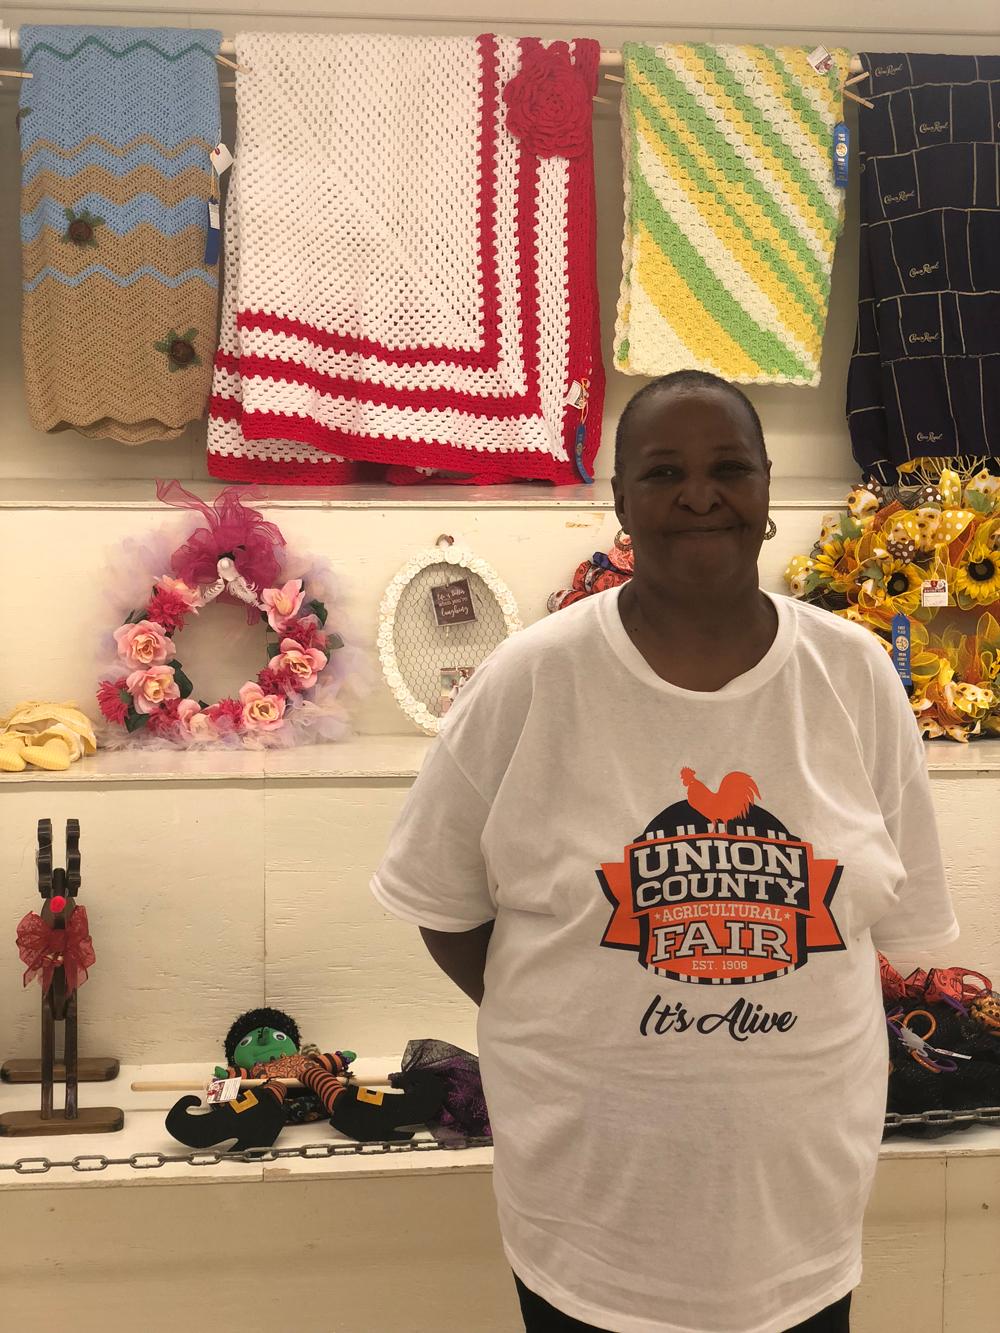 union-county-fair-arts-crafts-food-exhibits (29)